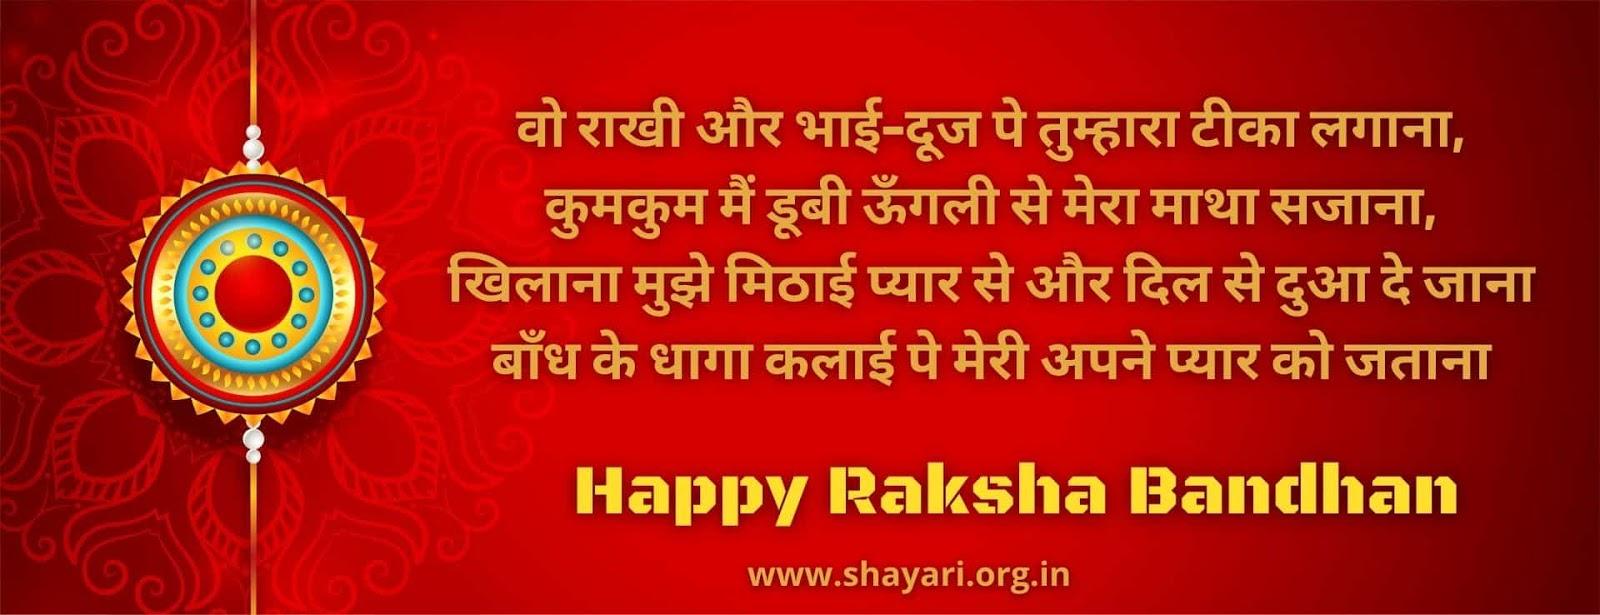 Latest 111+ Raksha Bandhan Shayari  In Hindi 2020